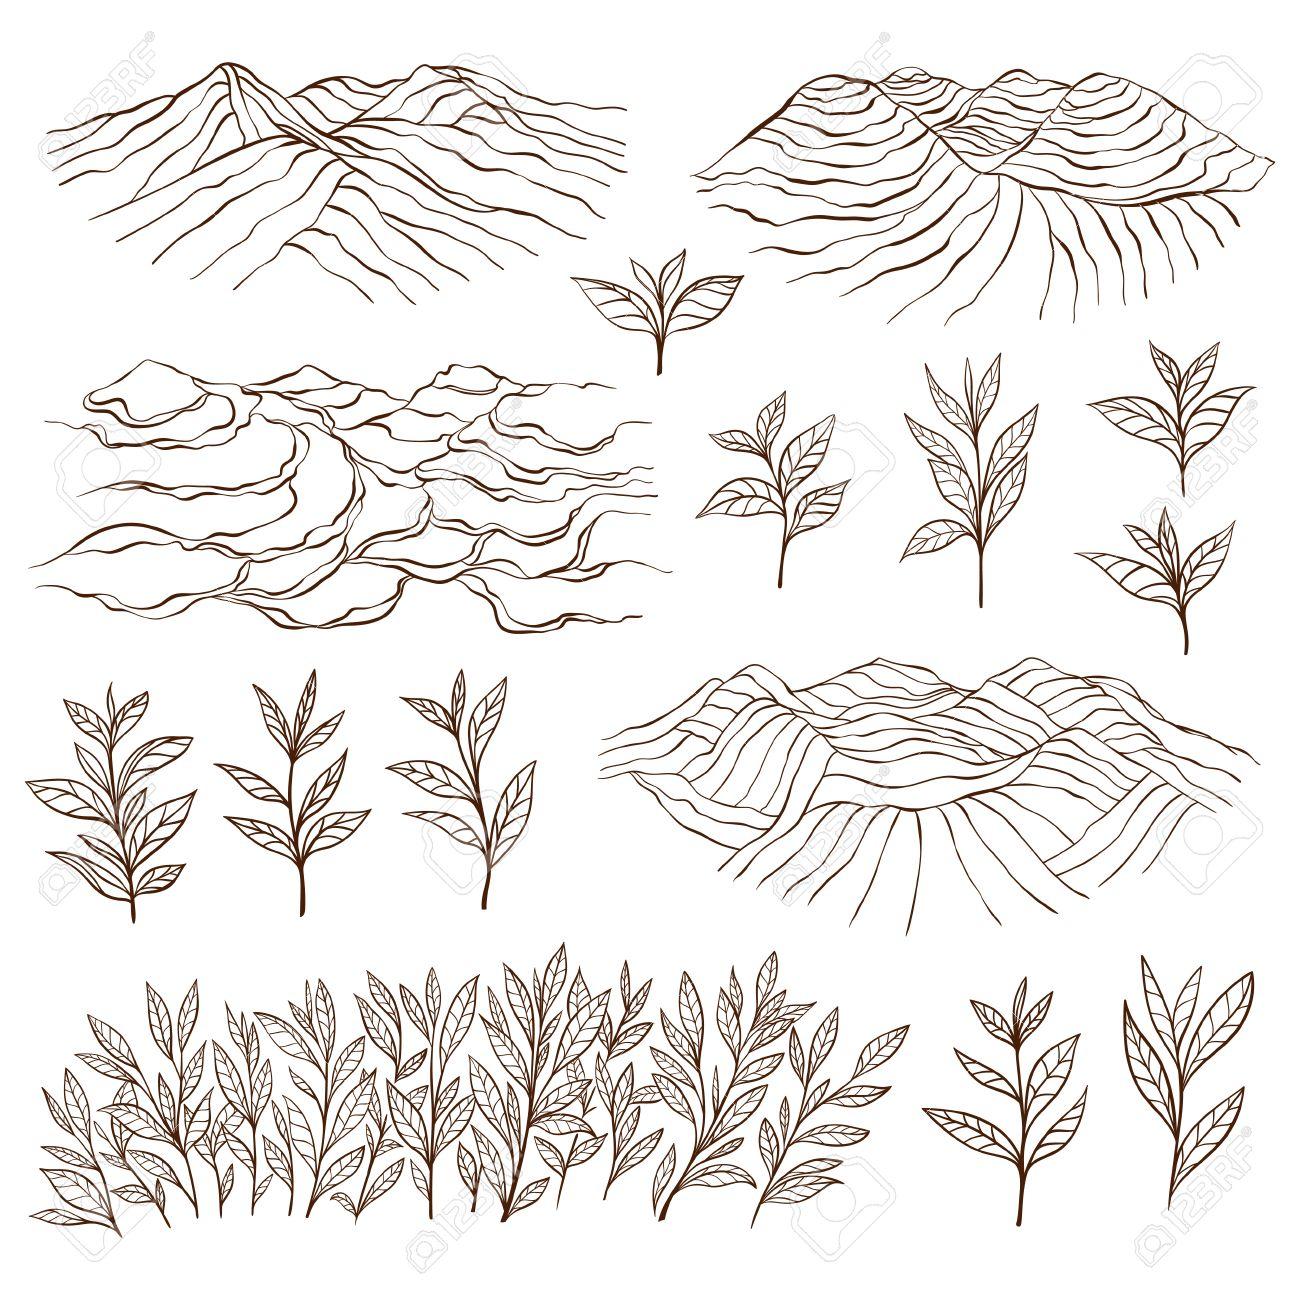 Tea plantations and plants. Tea garden on the hill. Tea bush. Tea leaves. Hand drawn vector illustration. - 57484273